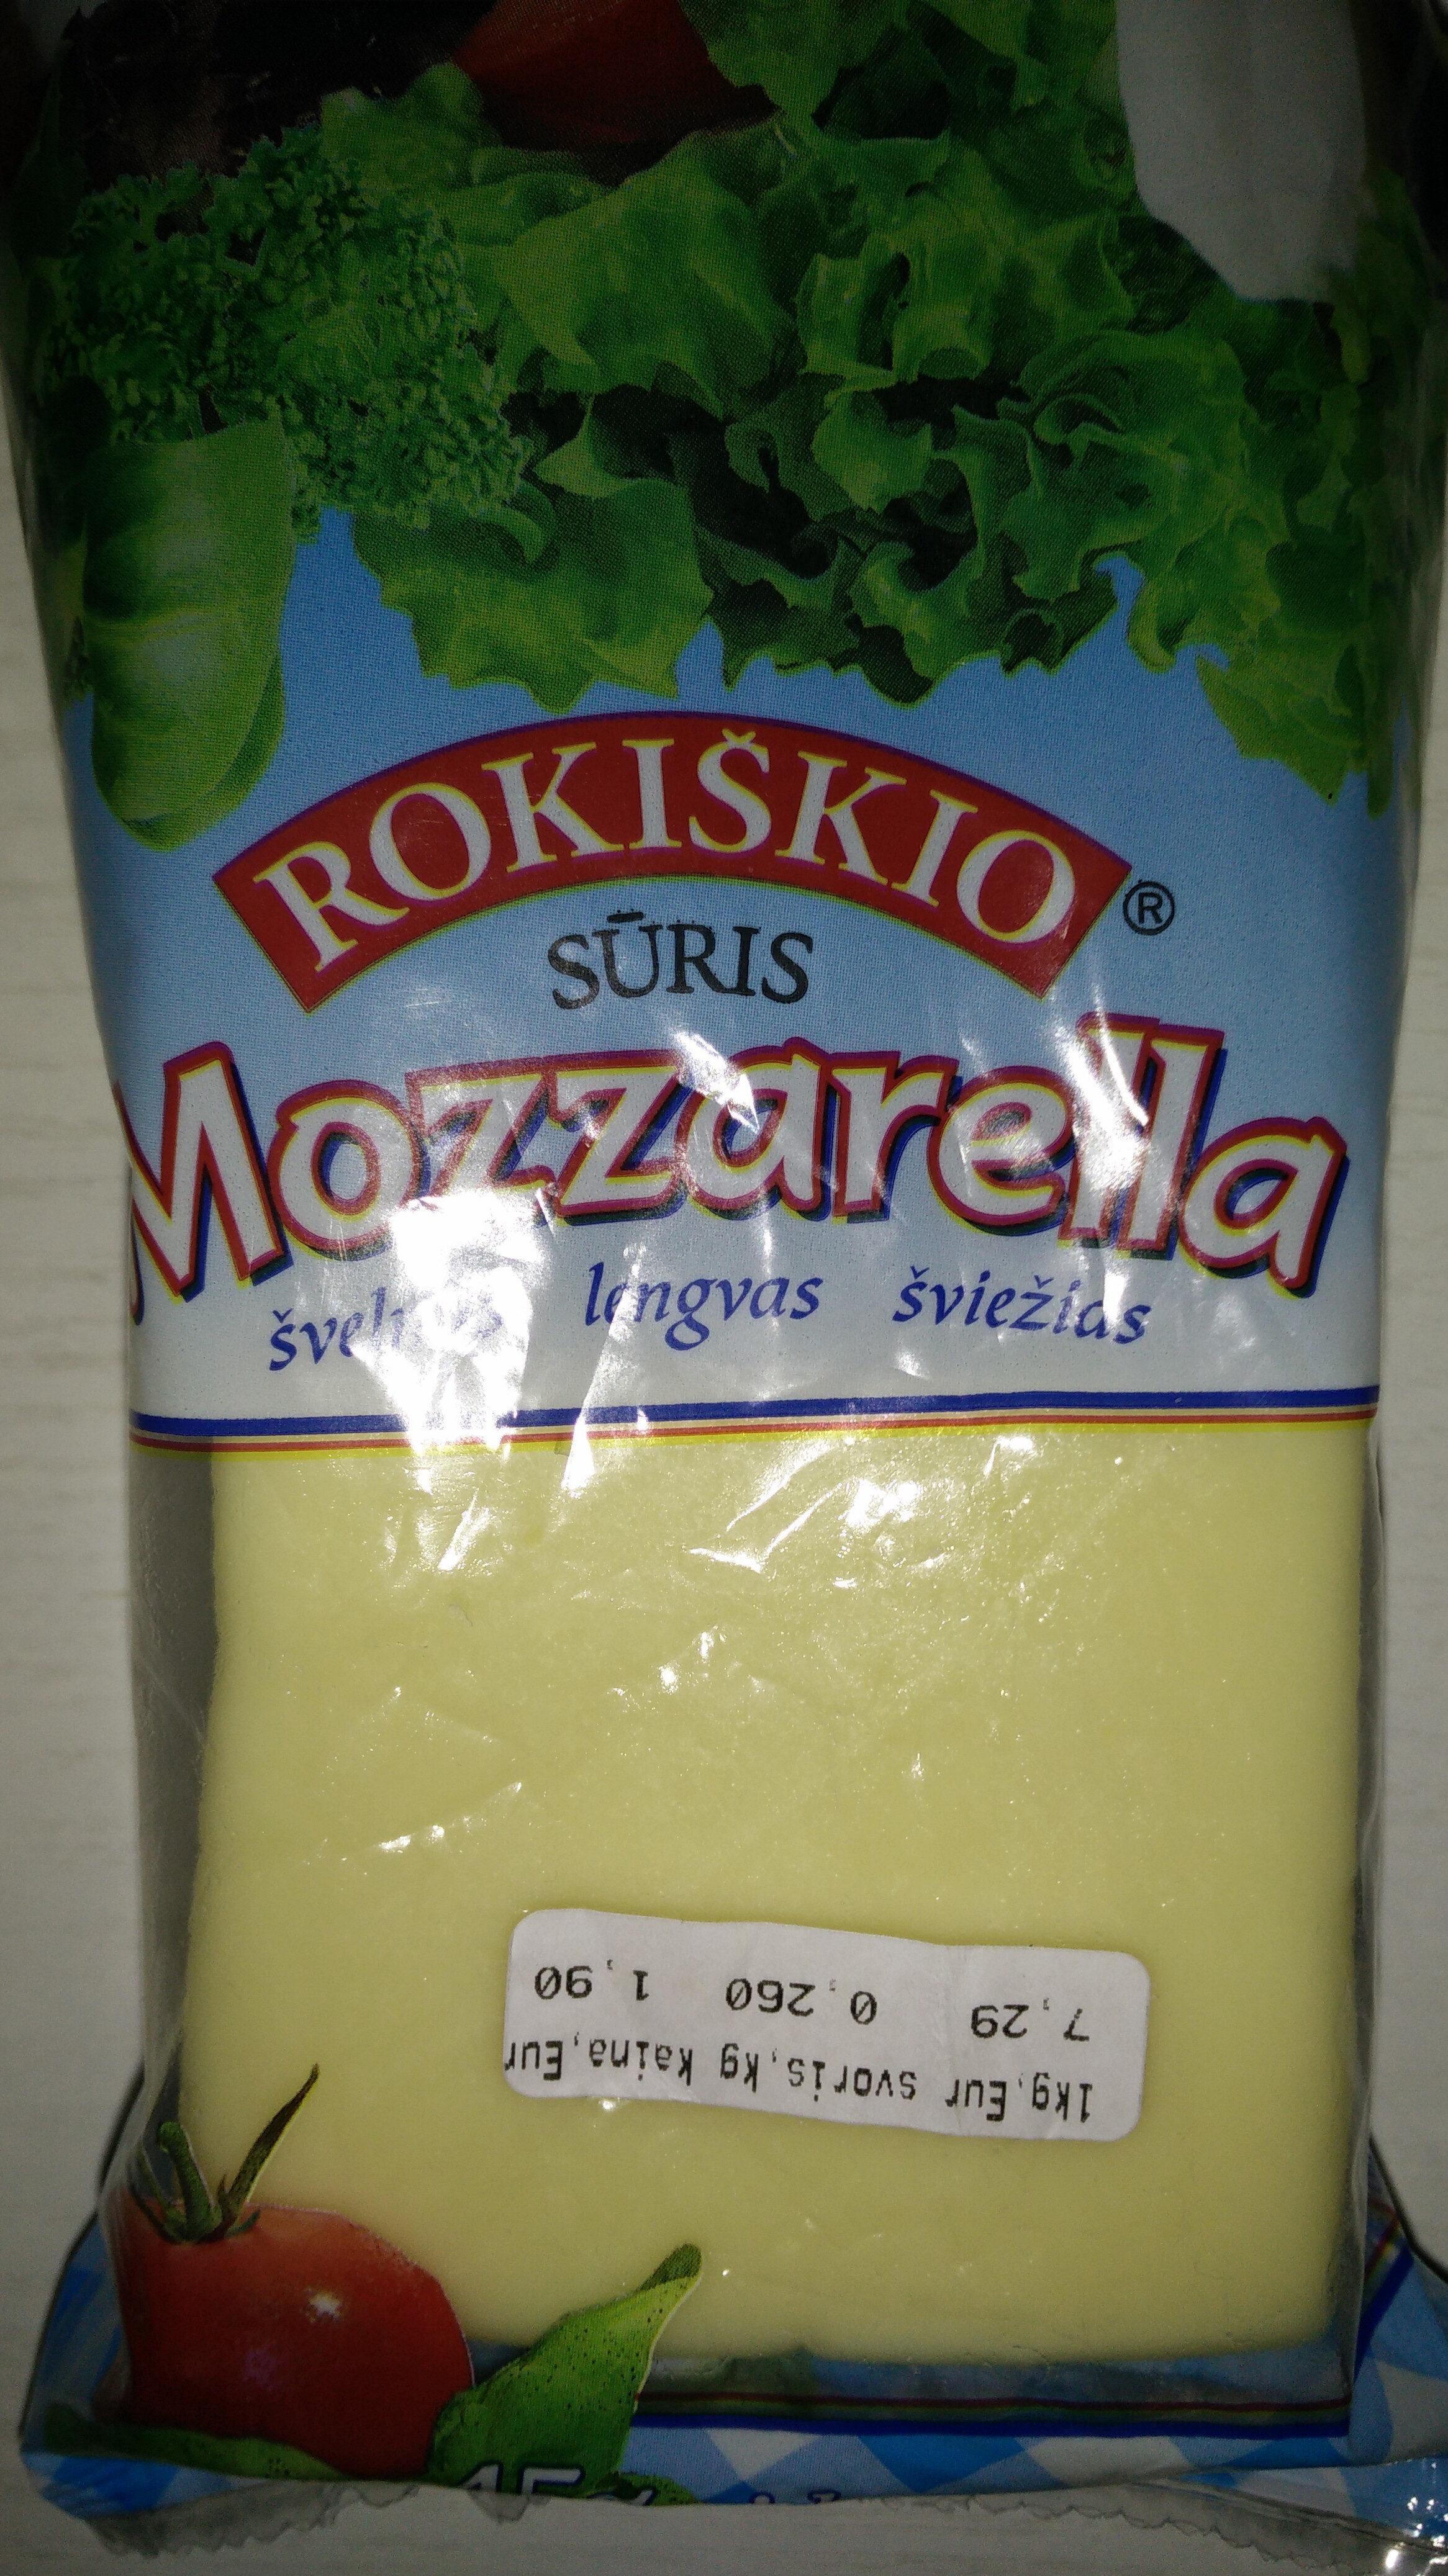 Mozzarella sūris 45% rieb. - Produktas - lt